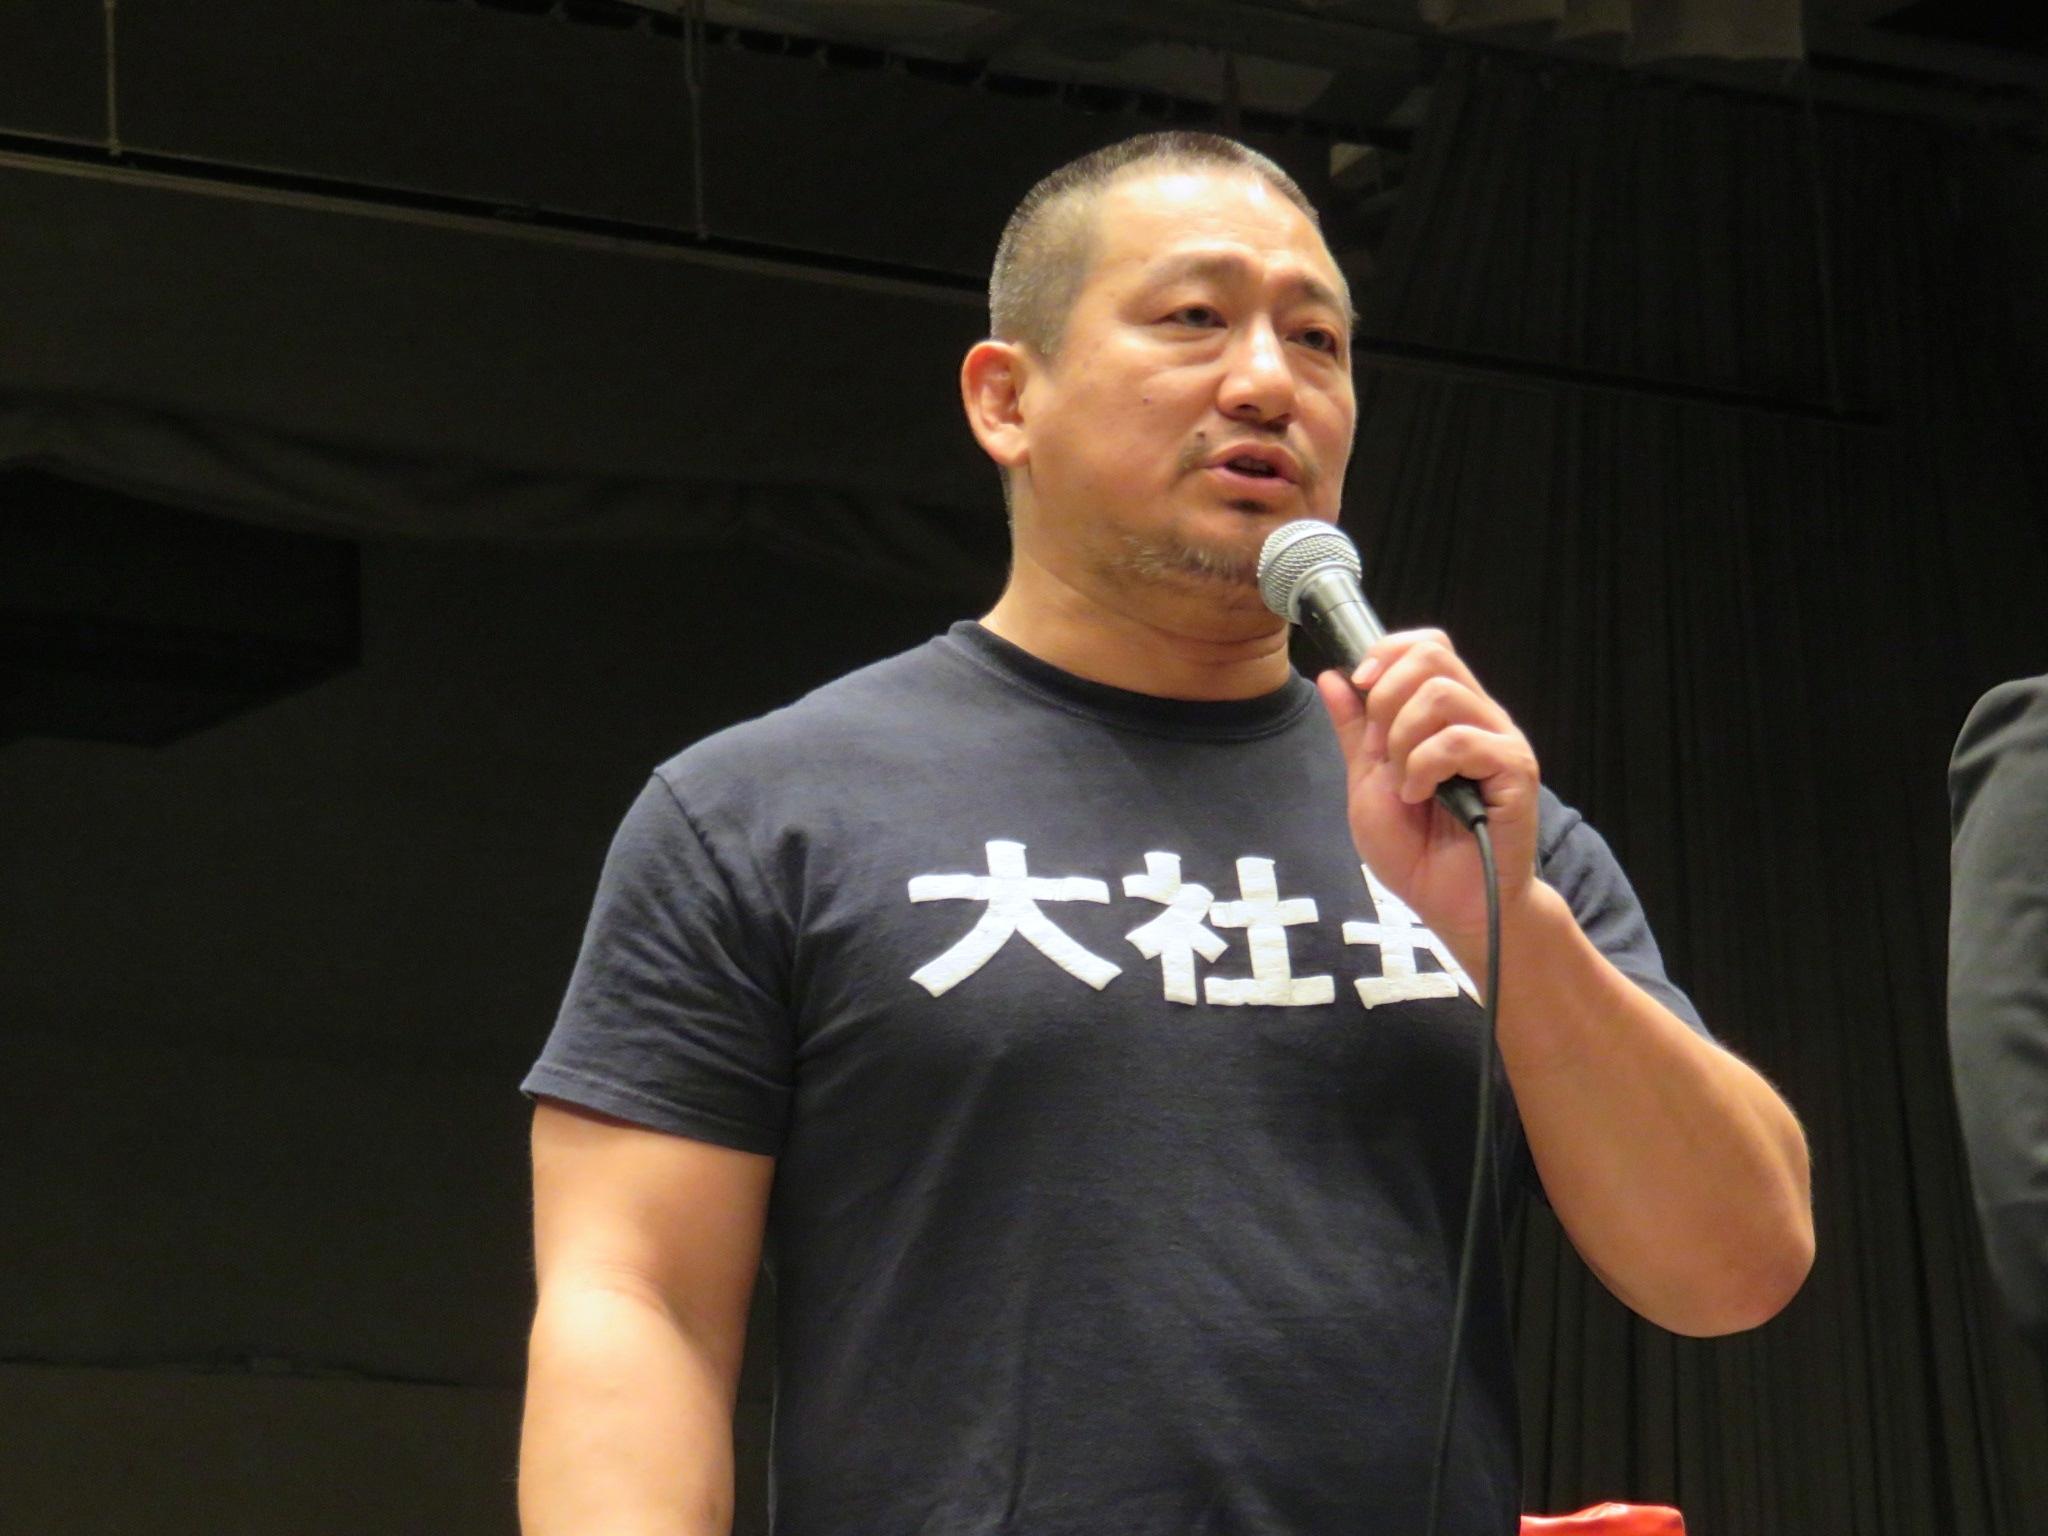 http://news.yoshimoto.co.jp/photos/uncategorized/2015/05/31/20150531173114-9cf9b06102a36e459411619b1e72f1ebbd49369d.jpg